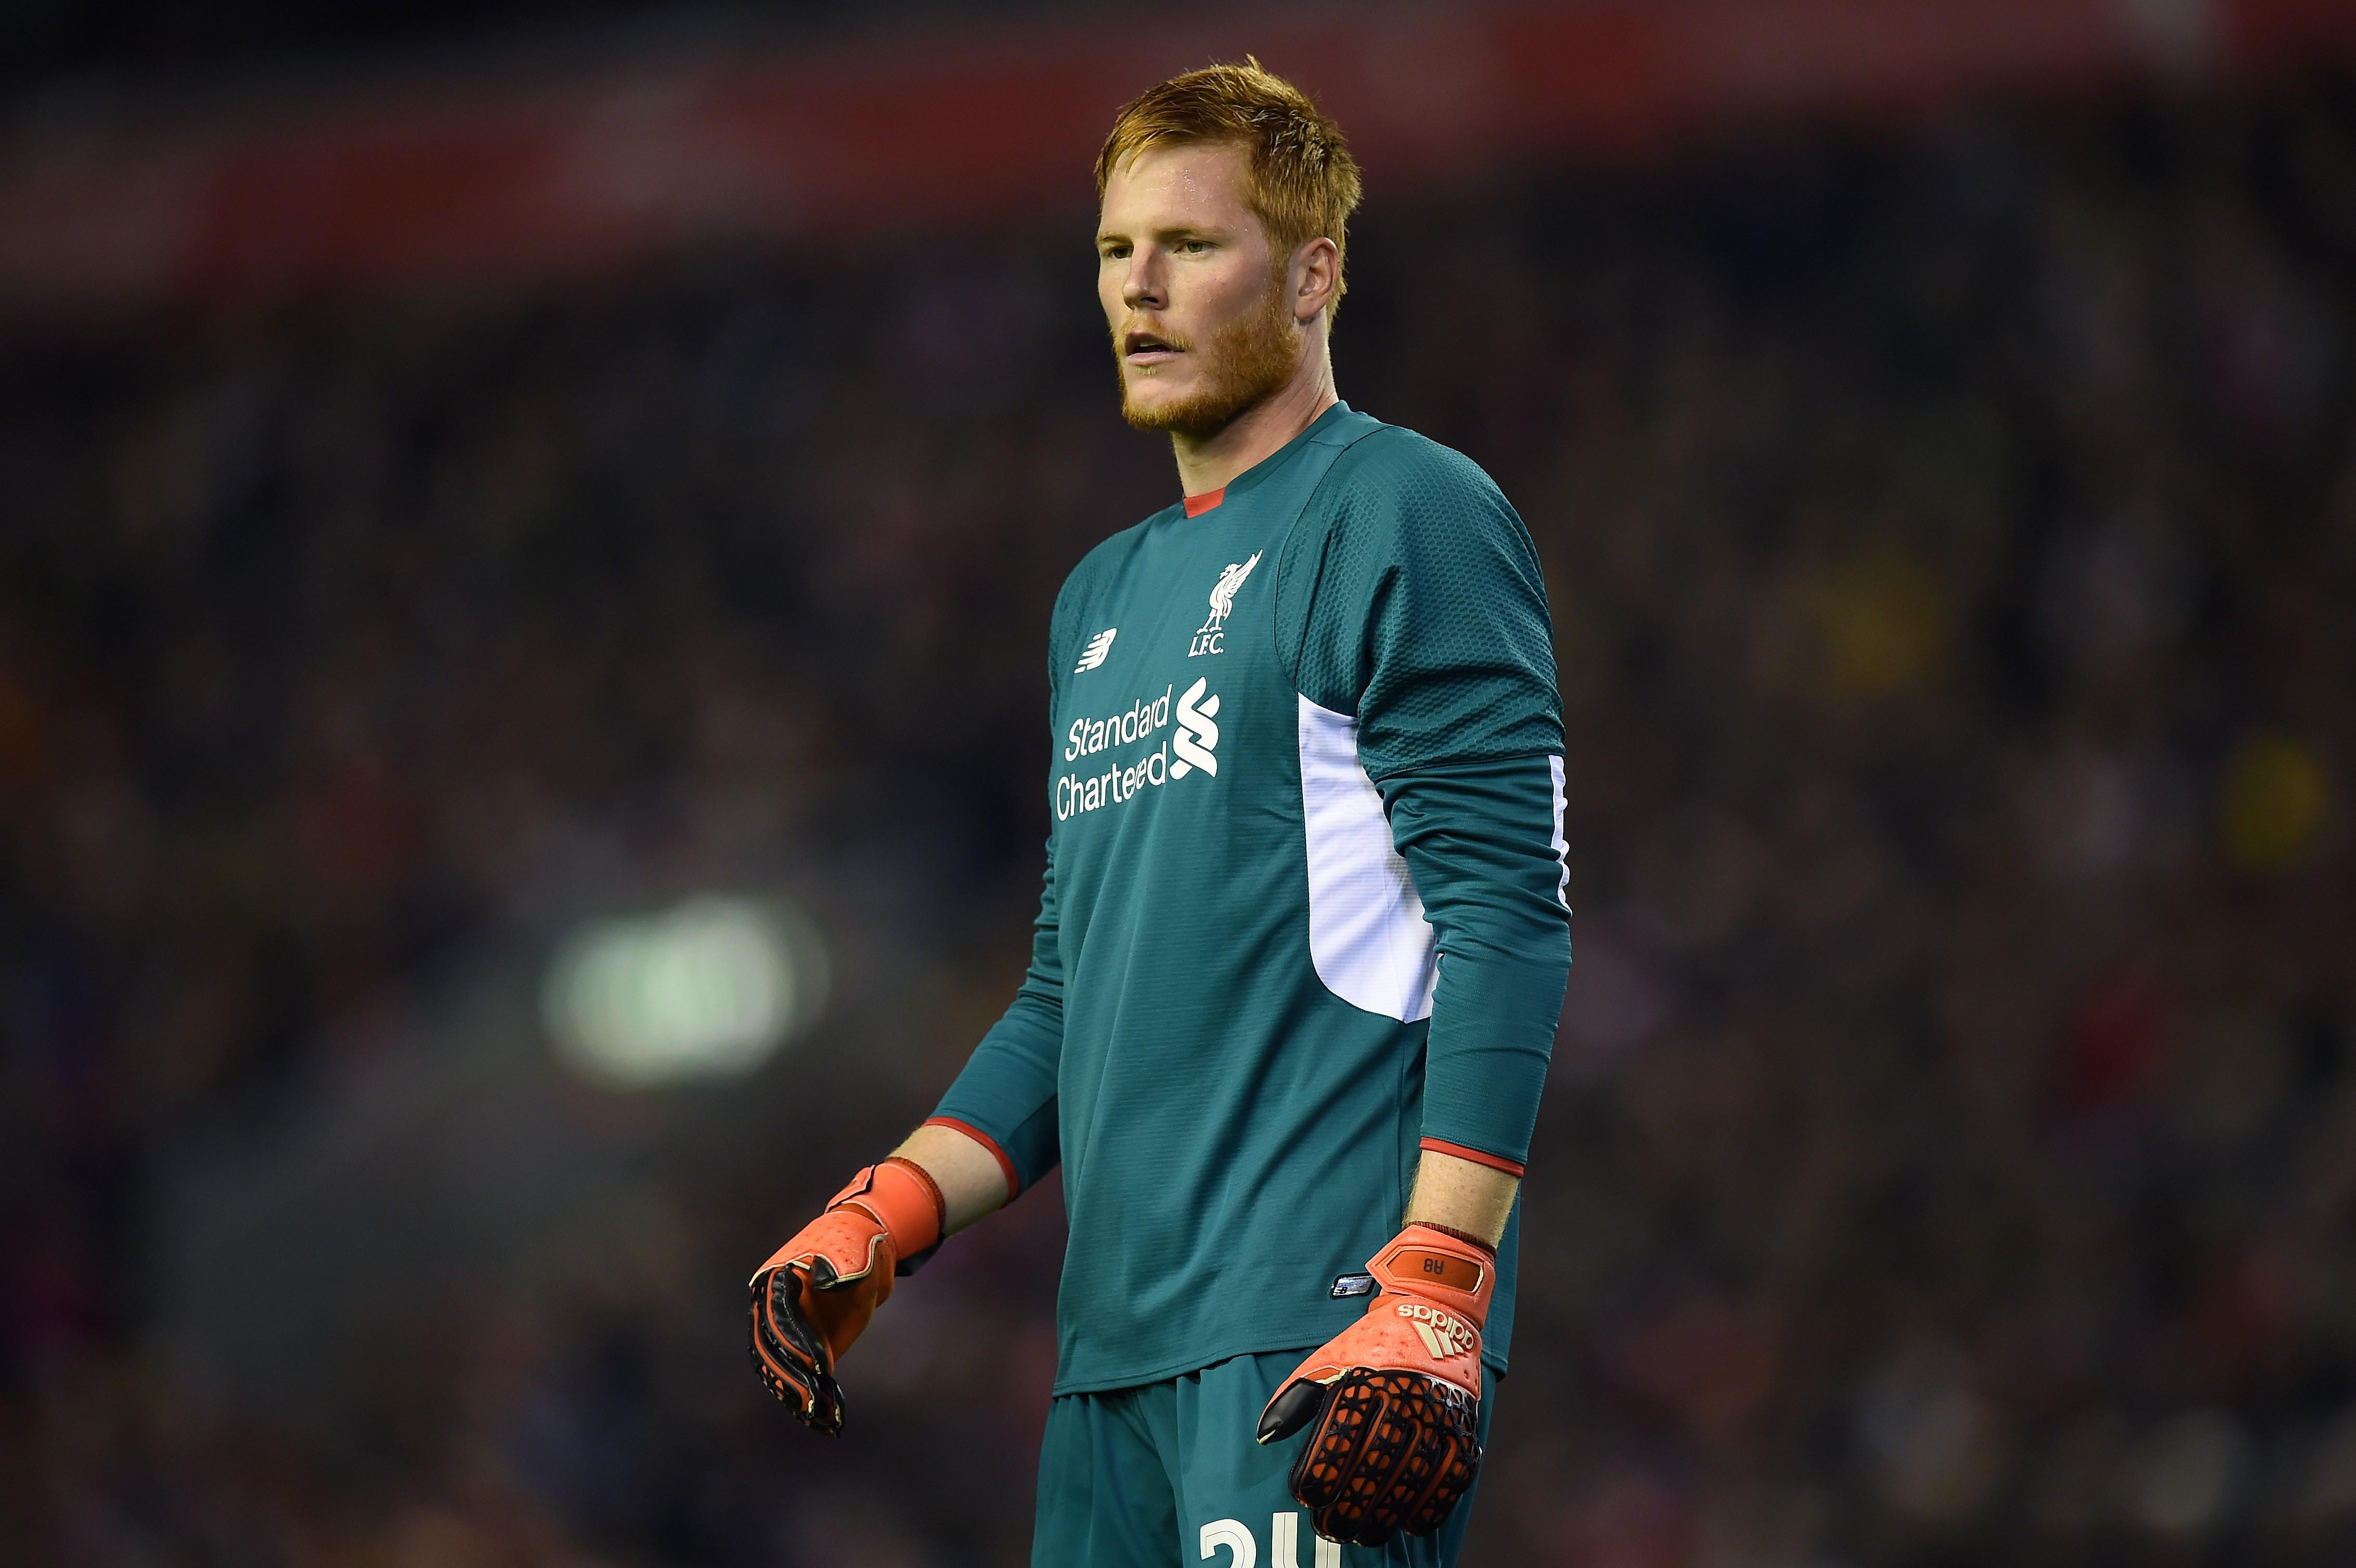 Liverpool goalkeeper Adam Bogdan's fate rests with Danny Ward